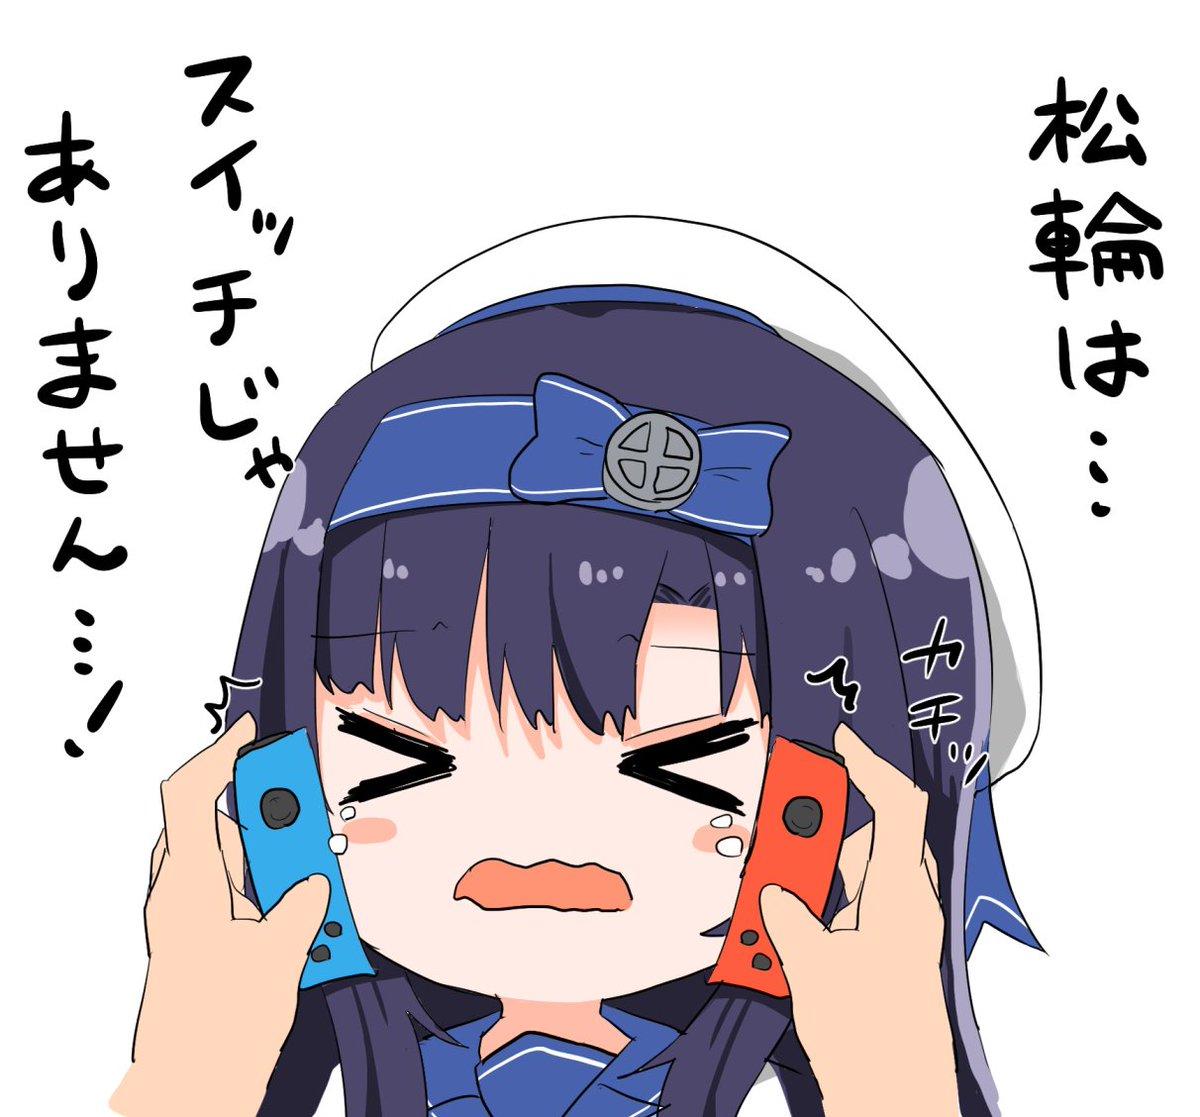 [C2] 今日官推廢文(活動後進入梅雨mode